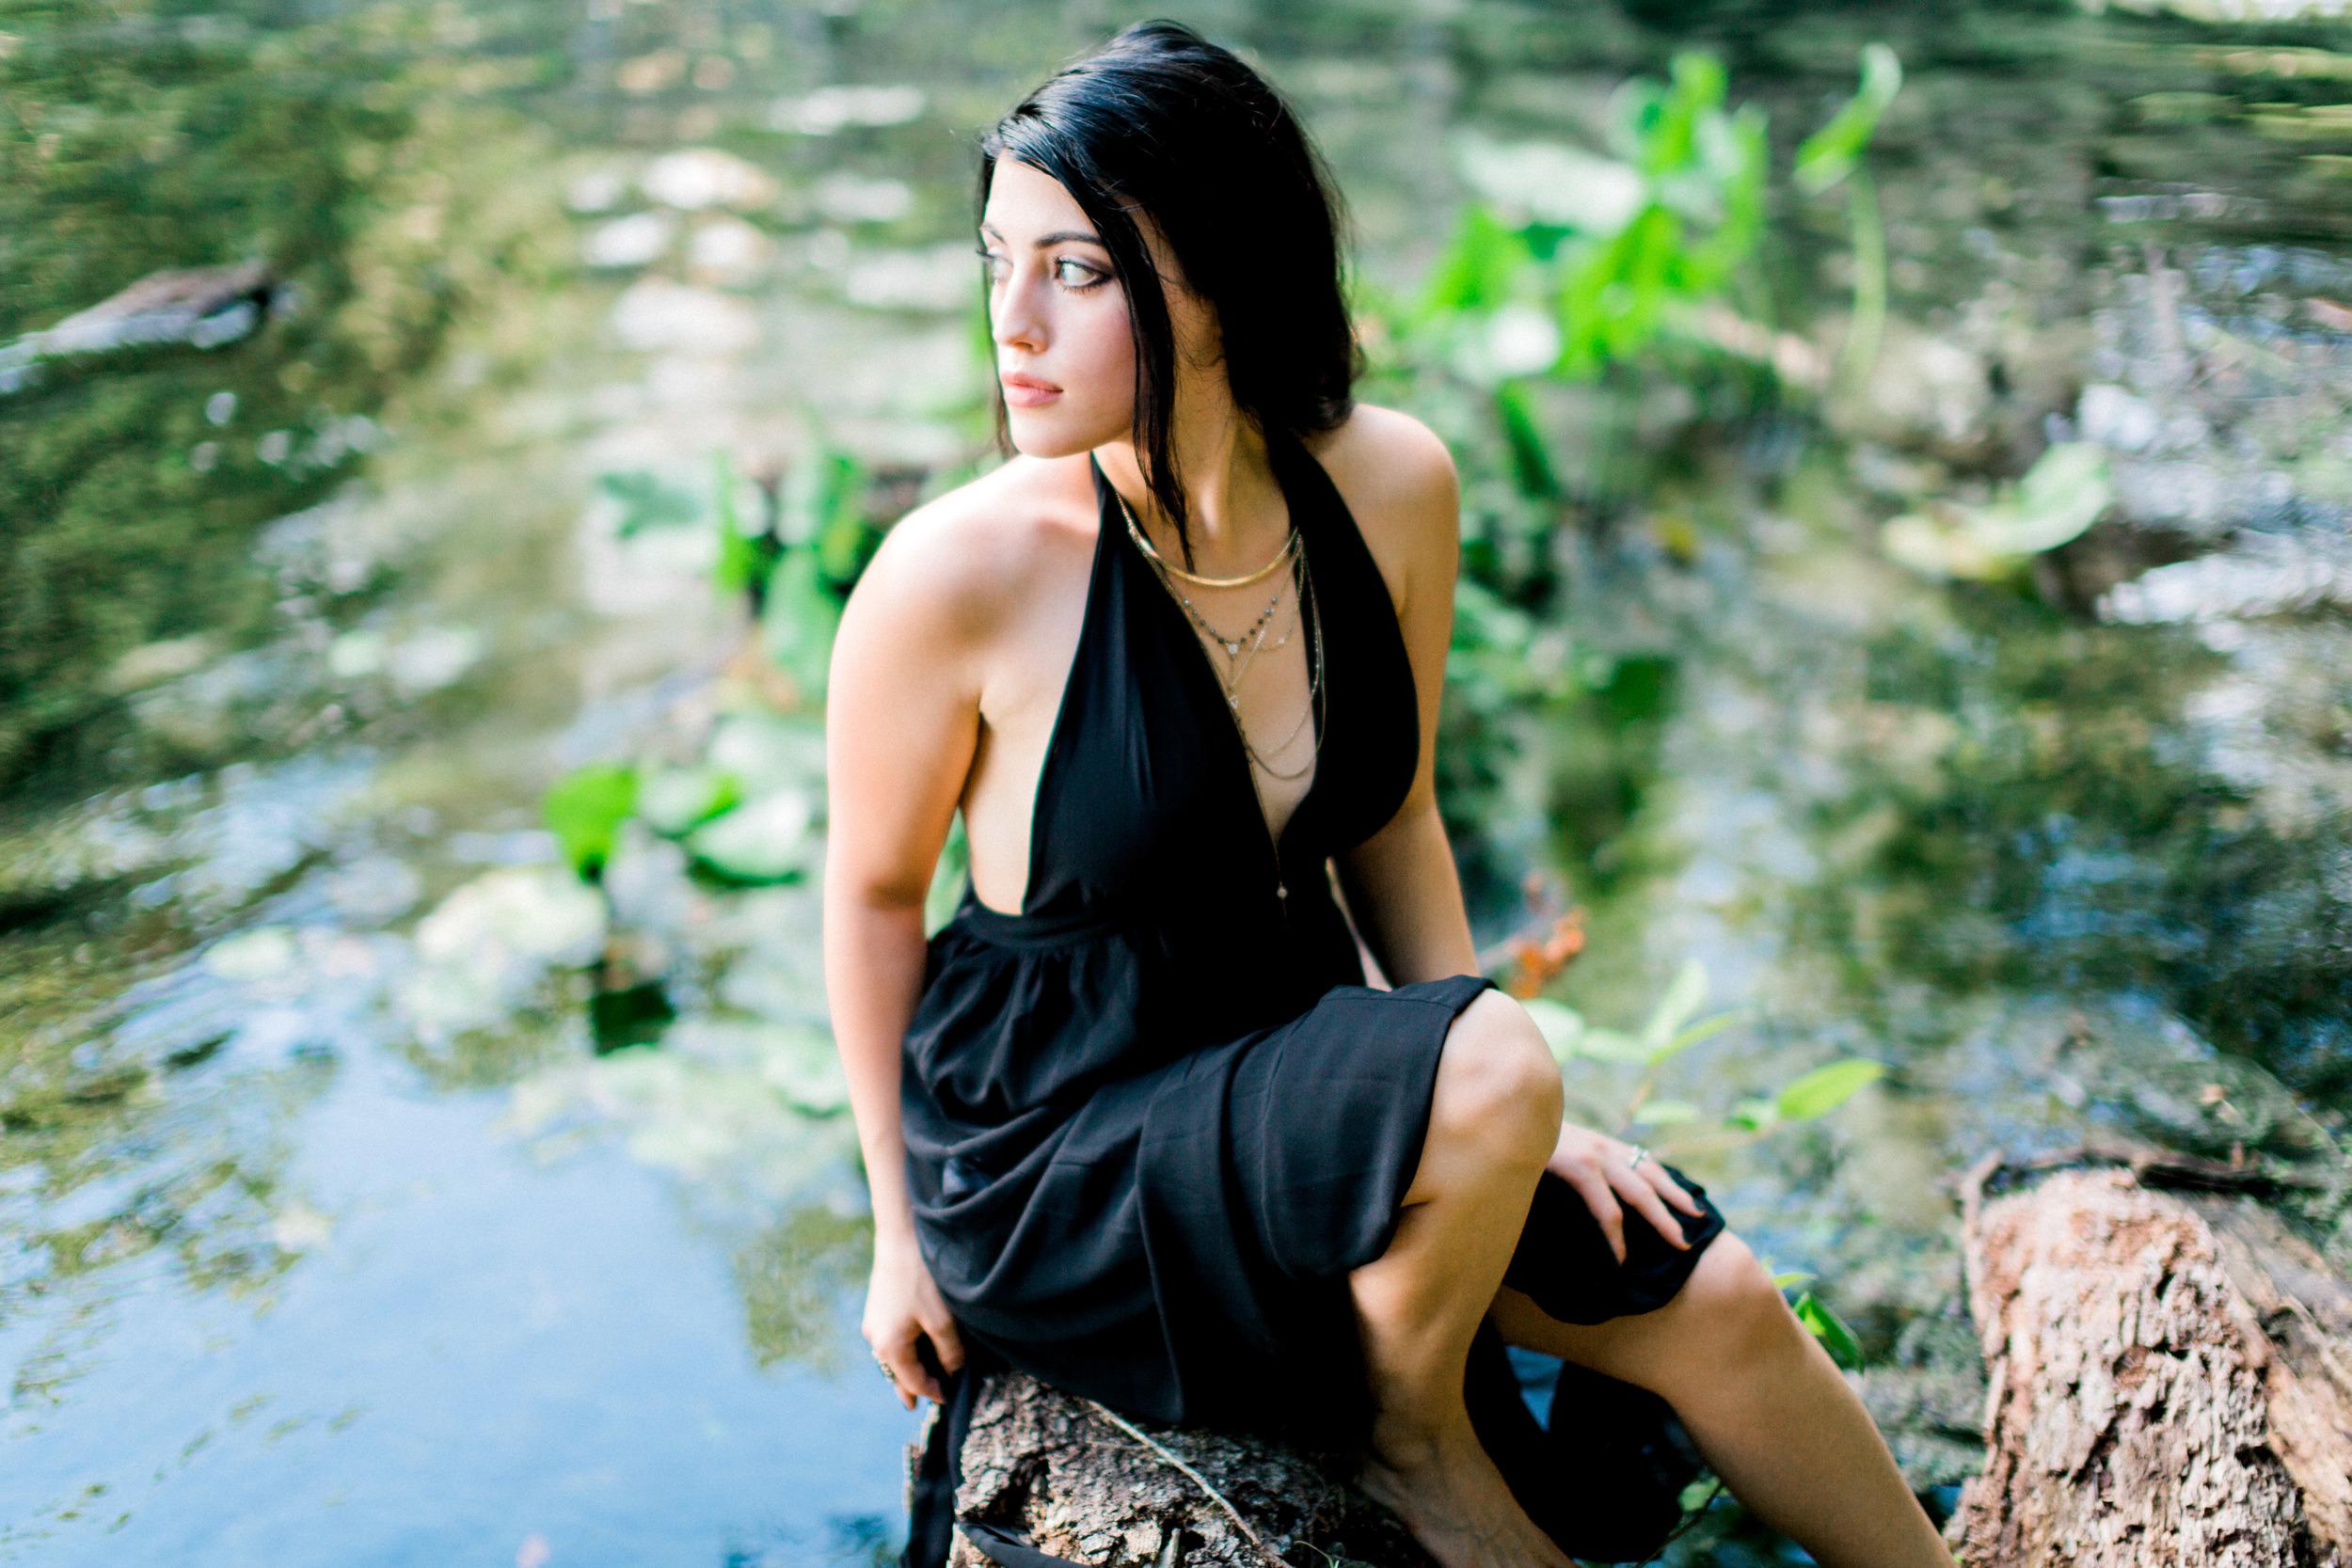 wekiva springs orlando florida model in dress photograph